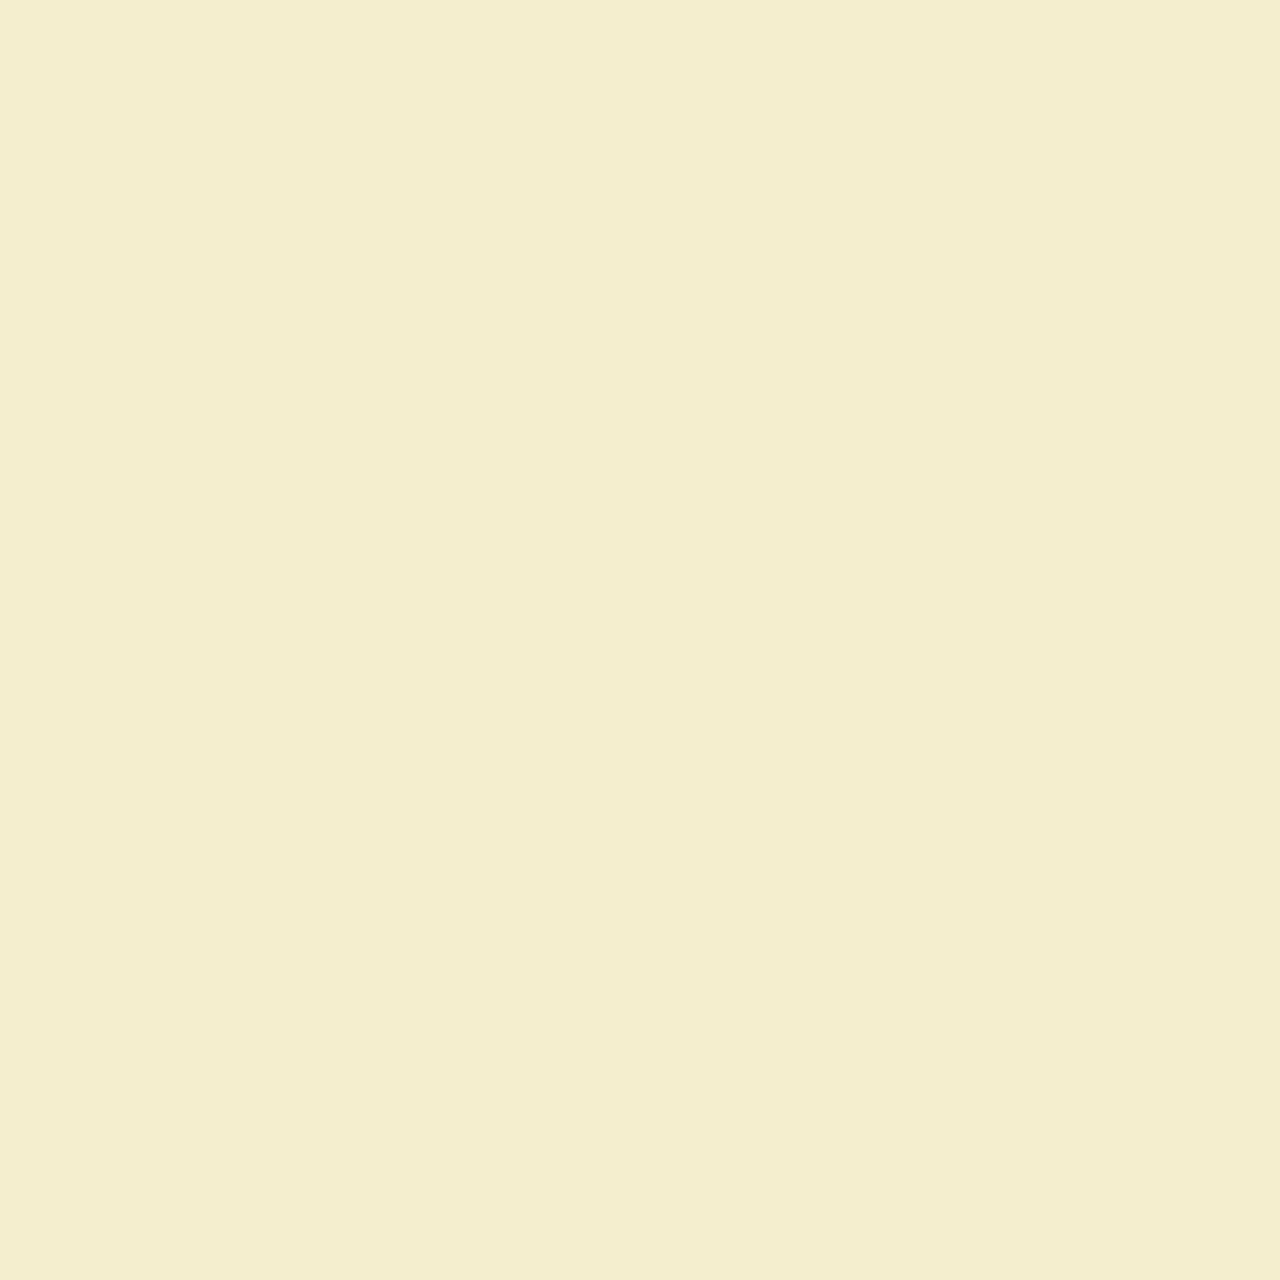 Lee Gels Sheet #007 Pale Yellow